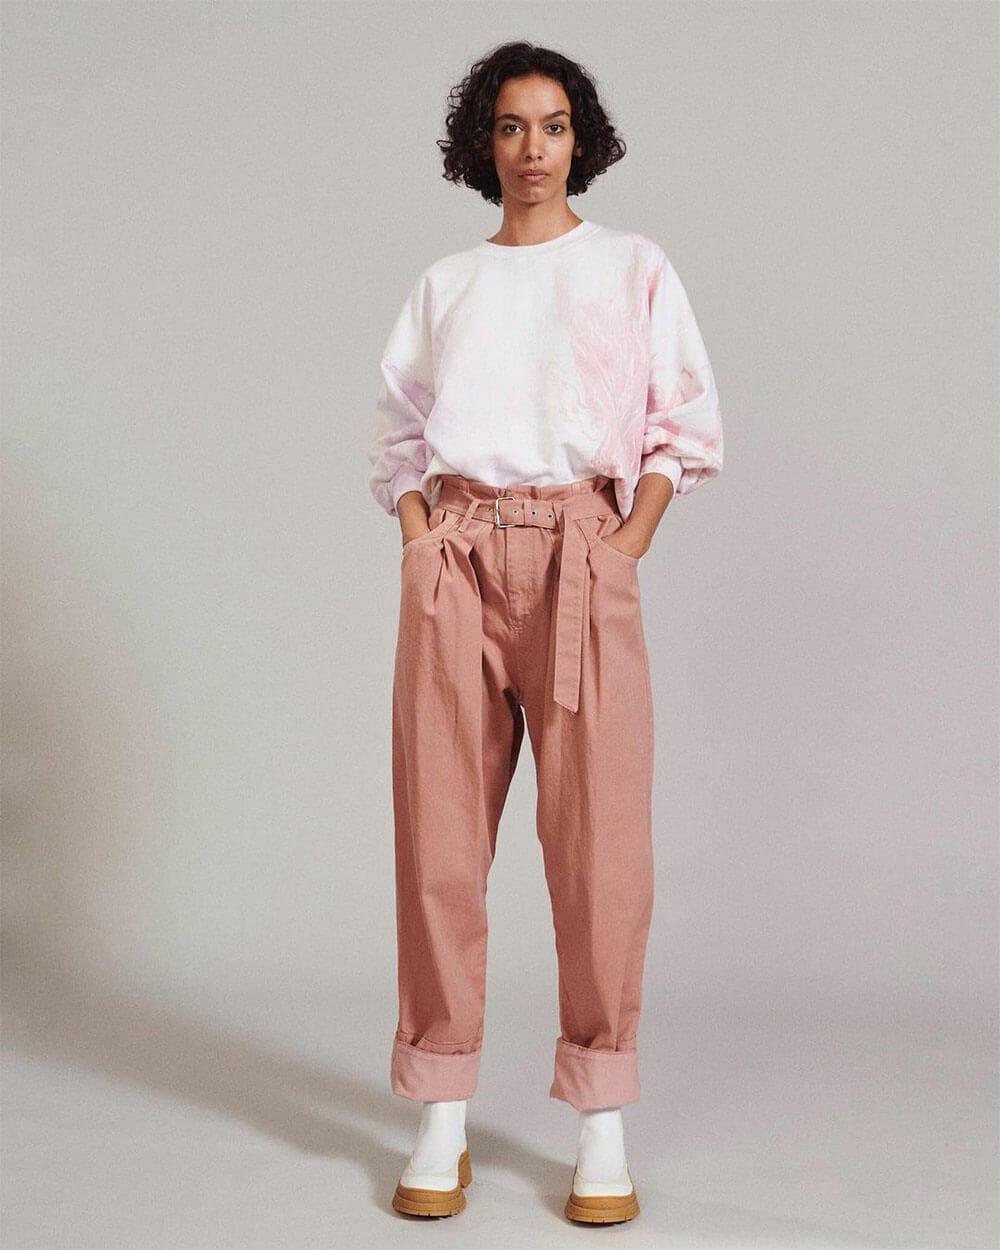 RACHEL COMEY petite clothing store